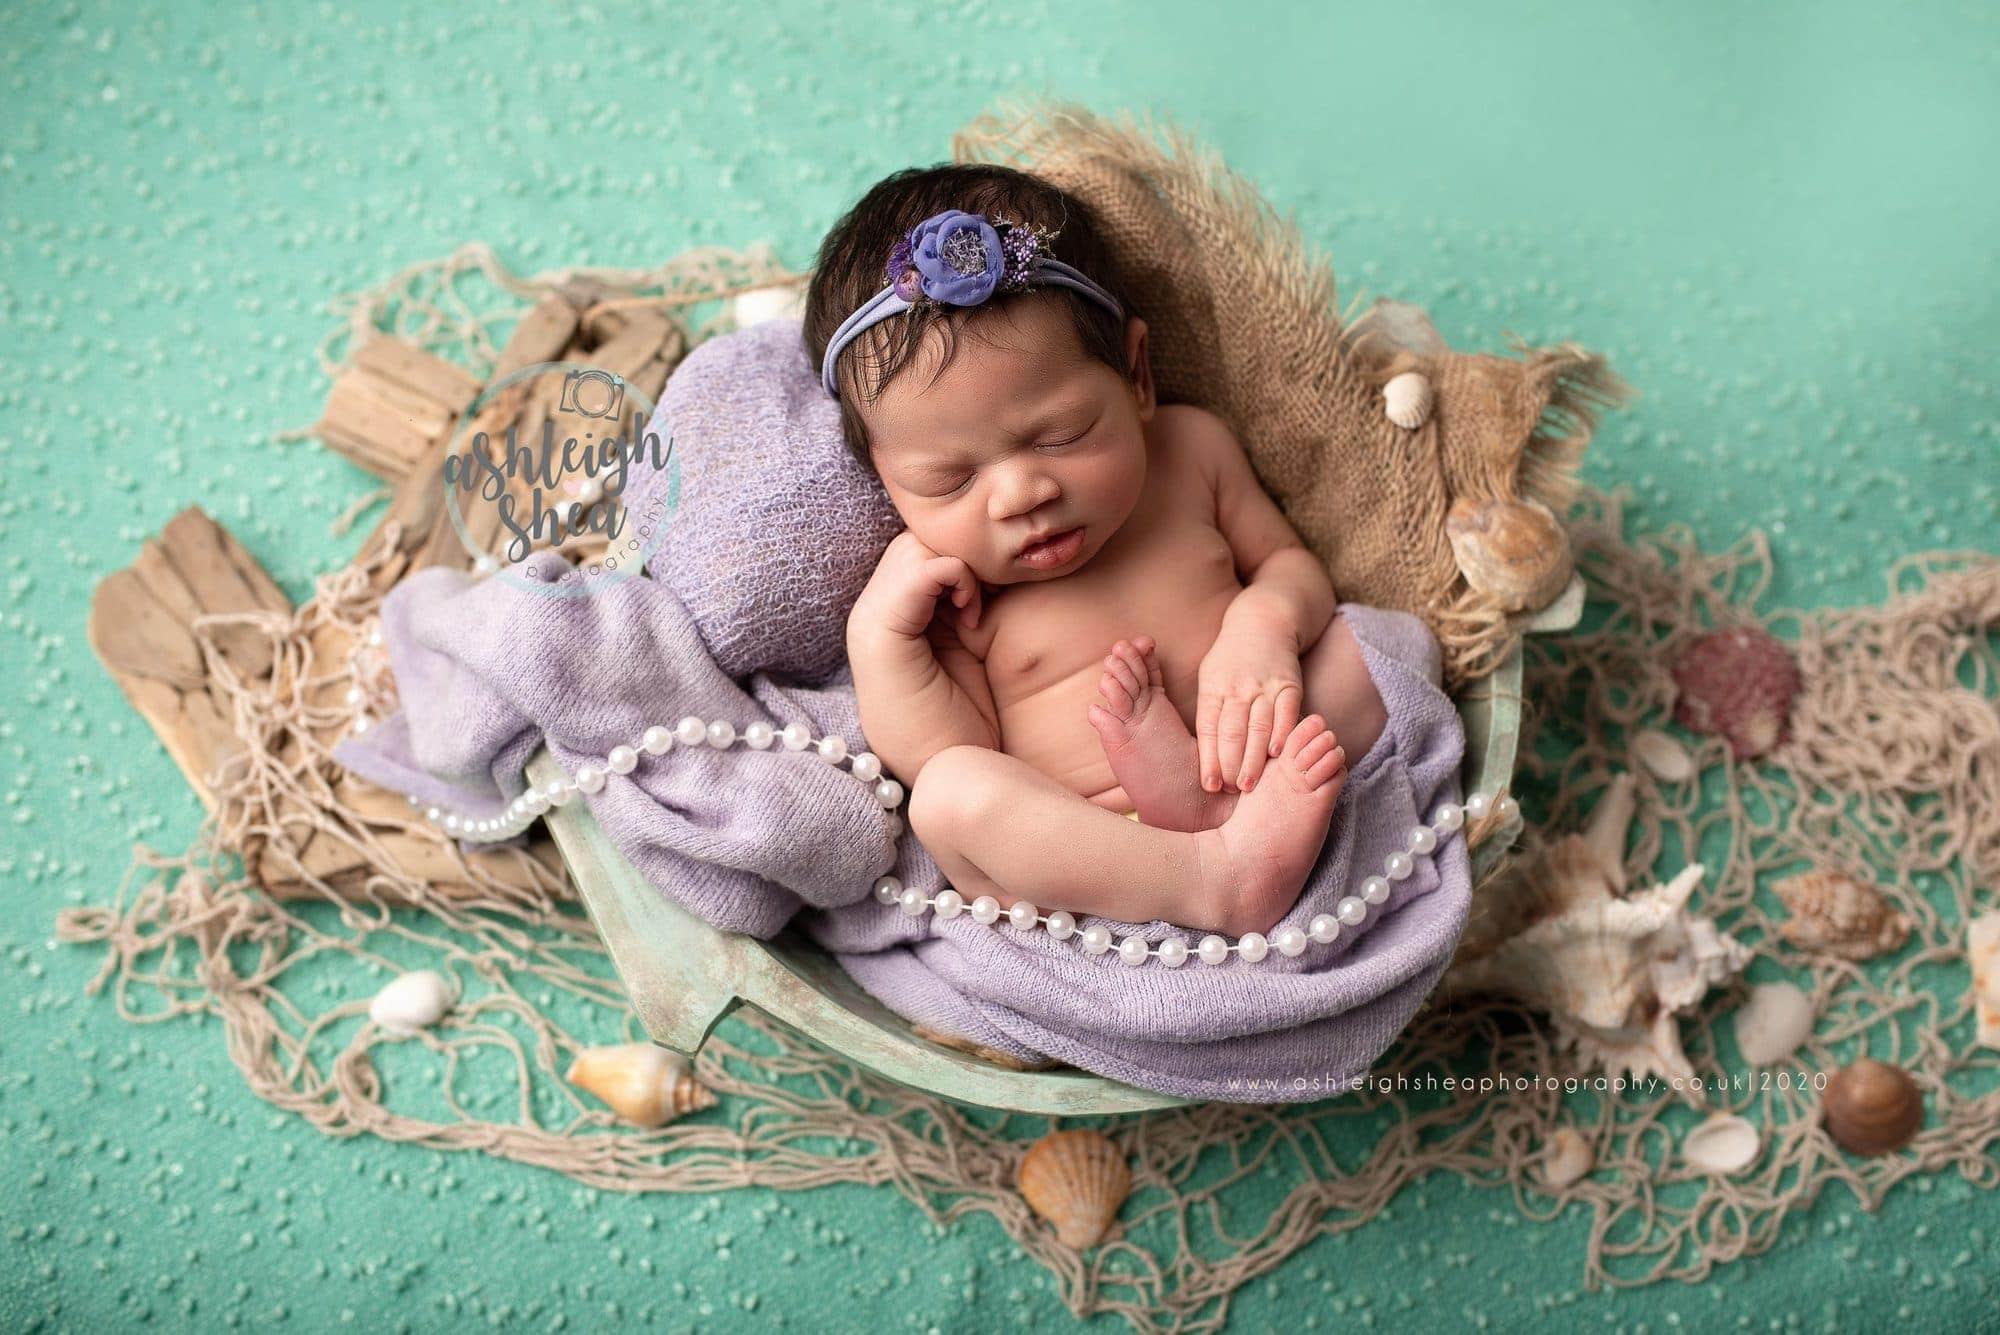 Little Mermaid, Disney Inspired, Ariel, Shells, Mermaid, Ashleigh Shea Photography, Baby Photos, London